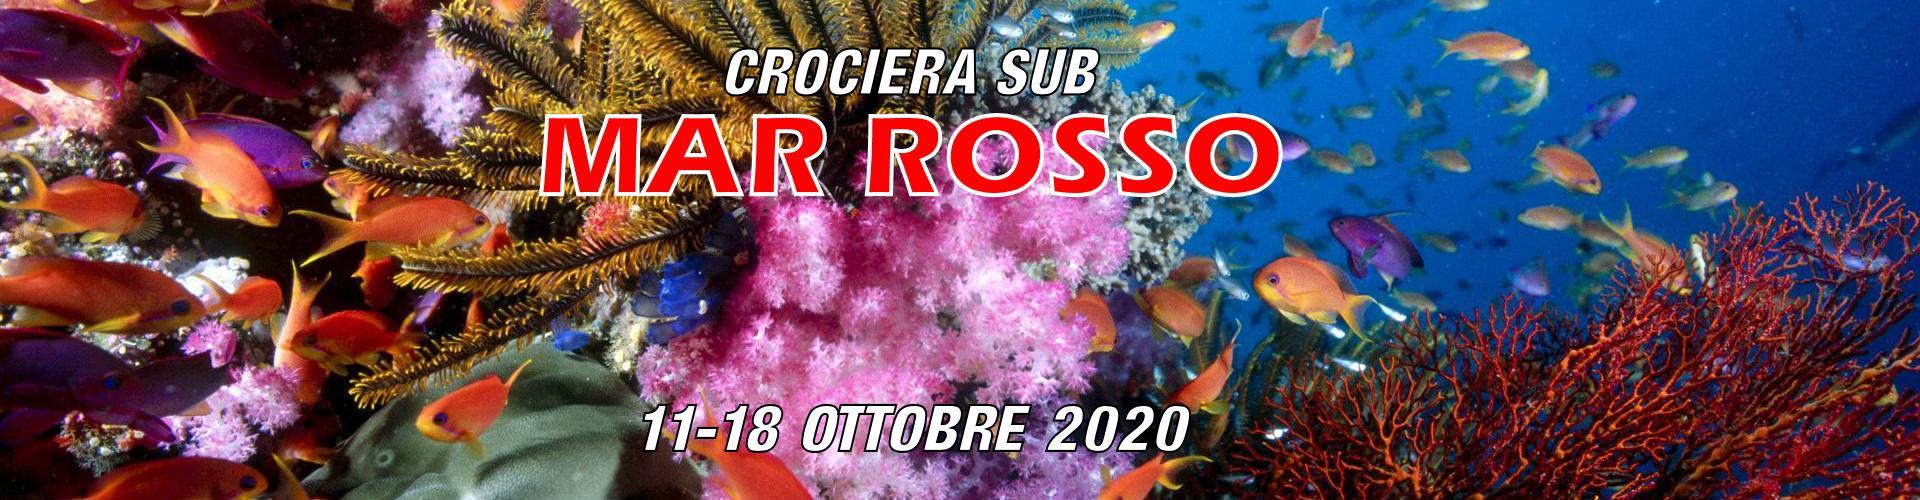 Crociera Mar Rosso Ottobre 2020